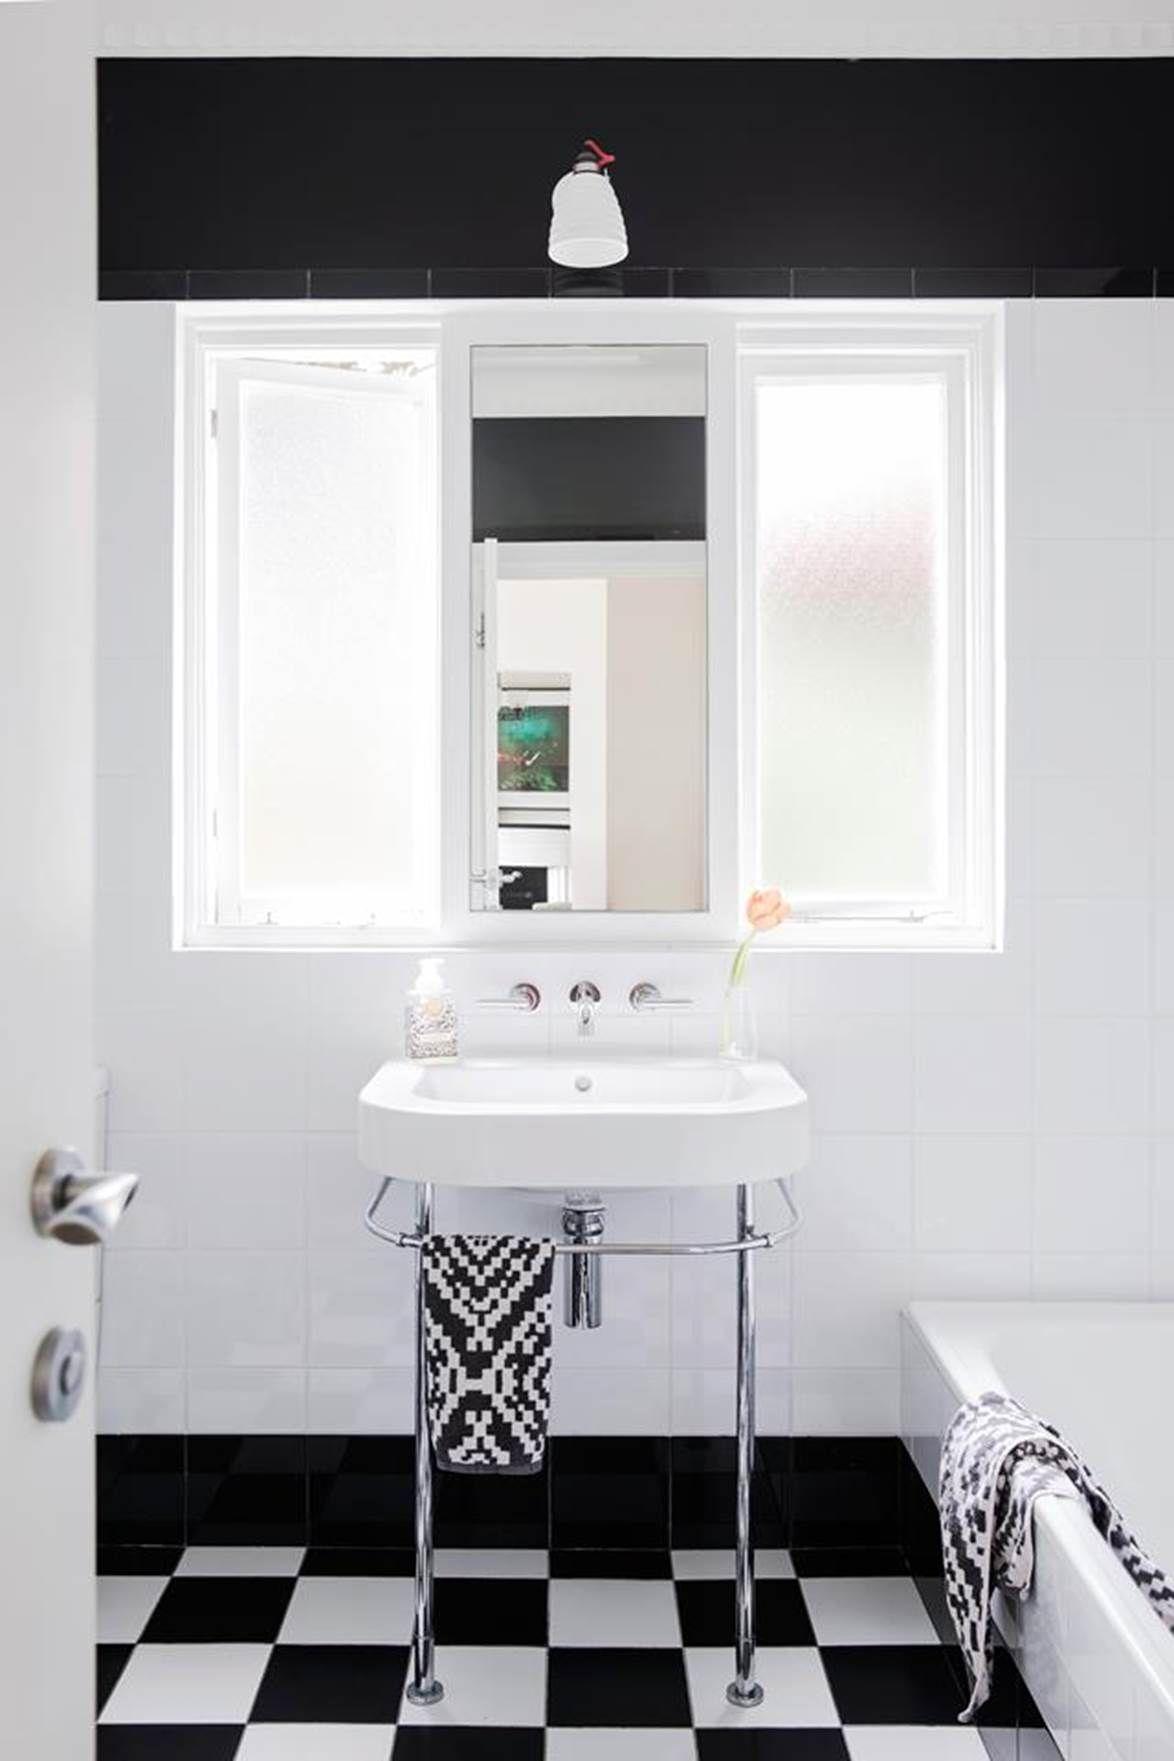 9 Small Bathrooms Design Ideas Bathroom Design Small Bathroom Renovation Cost Small Space Bathroom